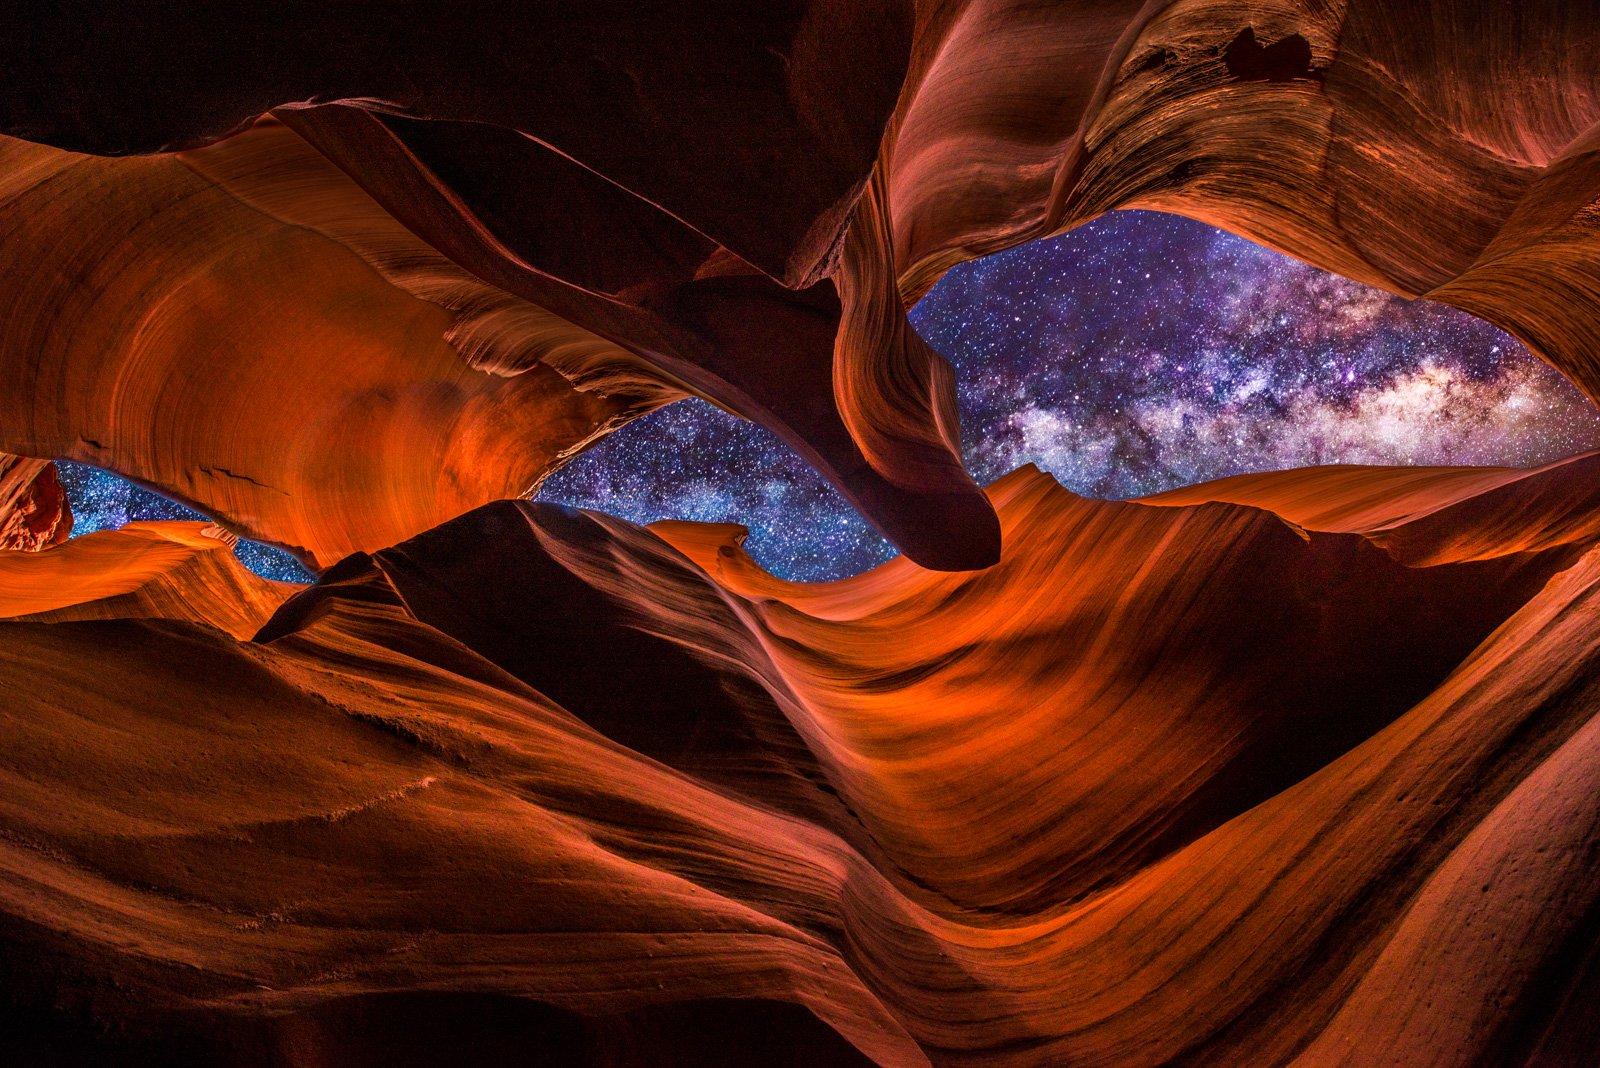 The Milky Way as seen from Antelope Canyon, Arizona https://t.co/1Bwj6ybViI